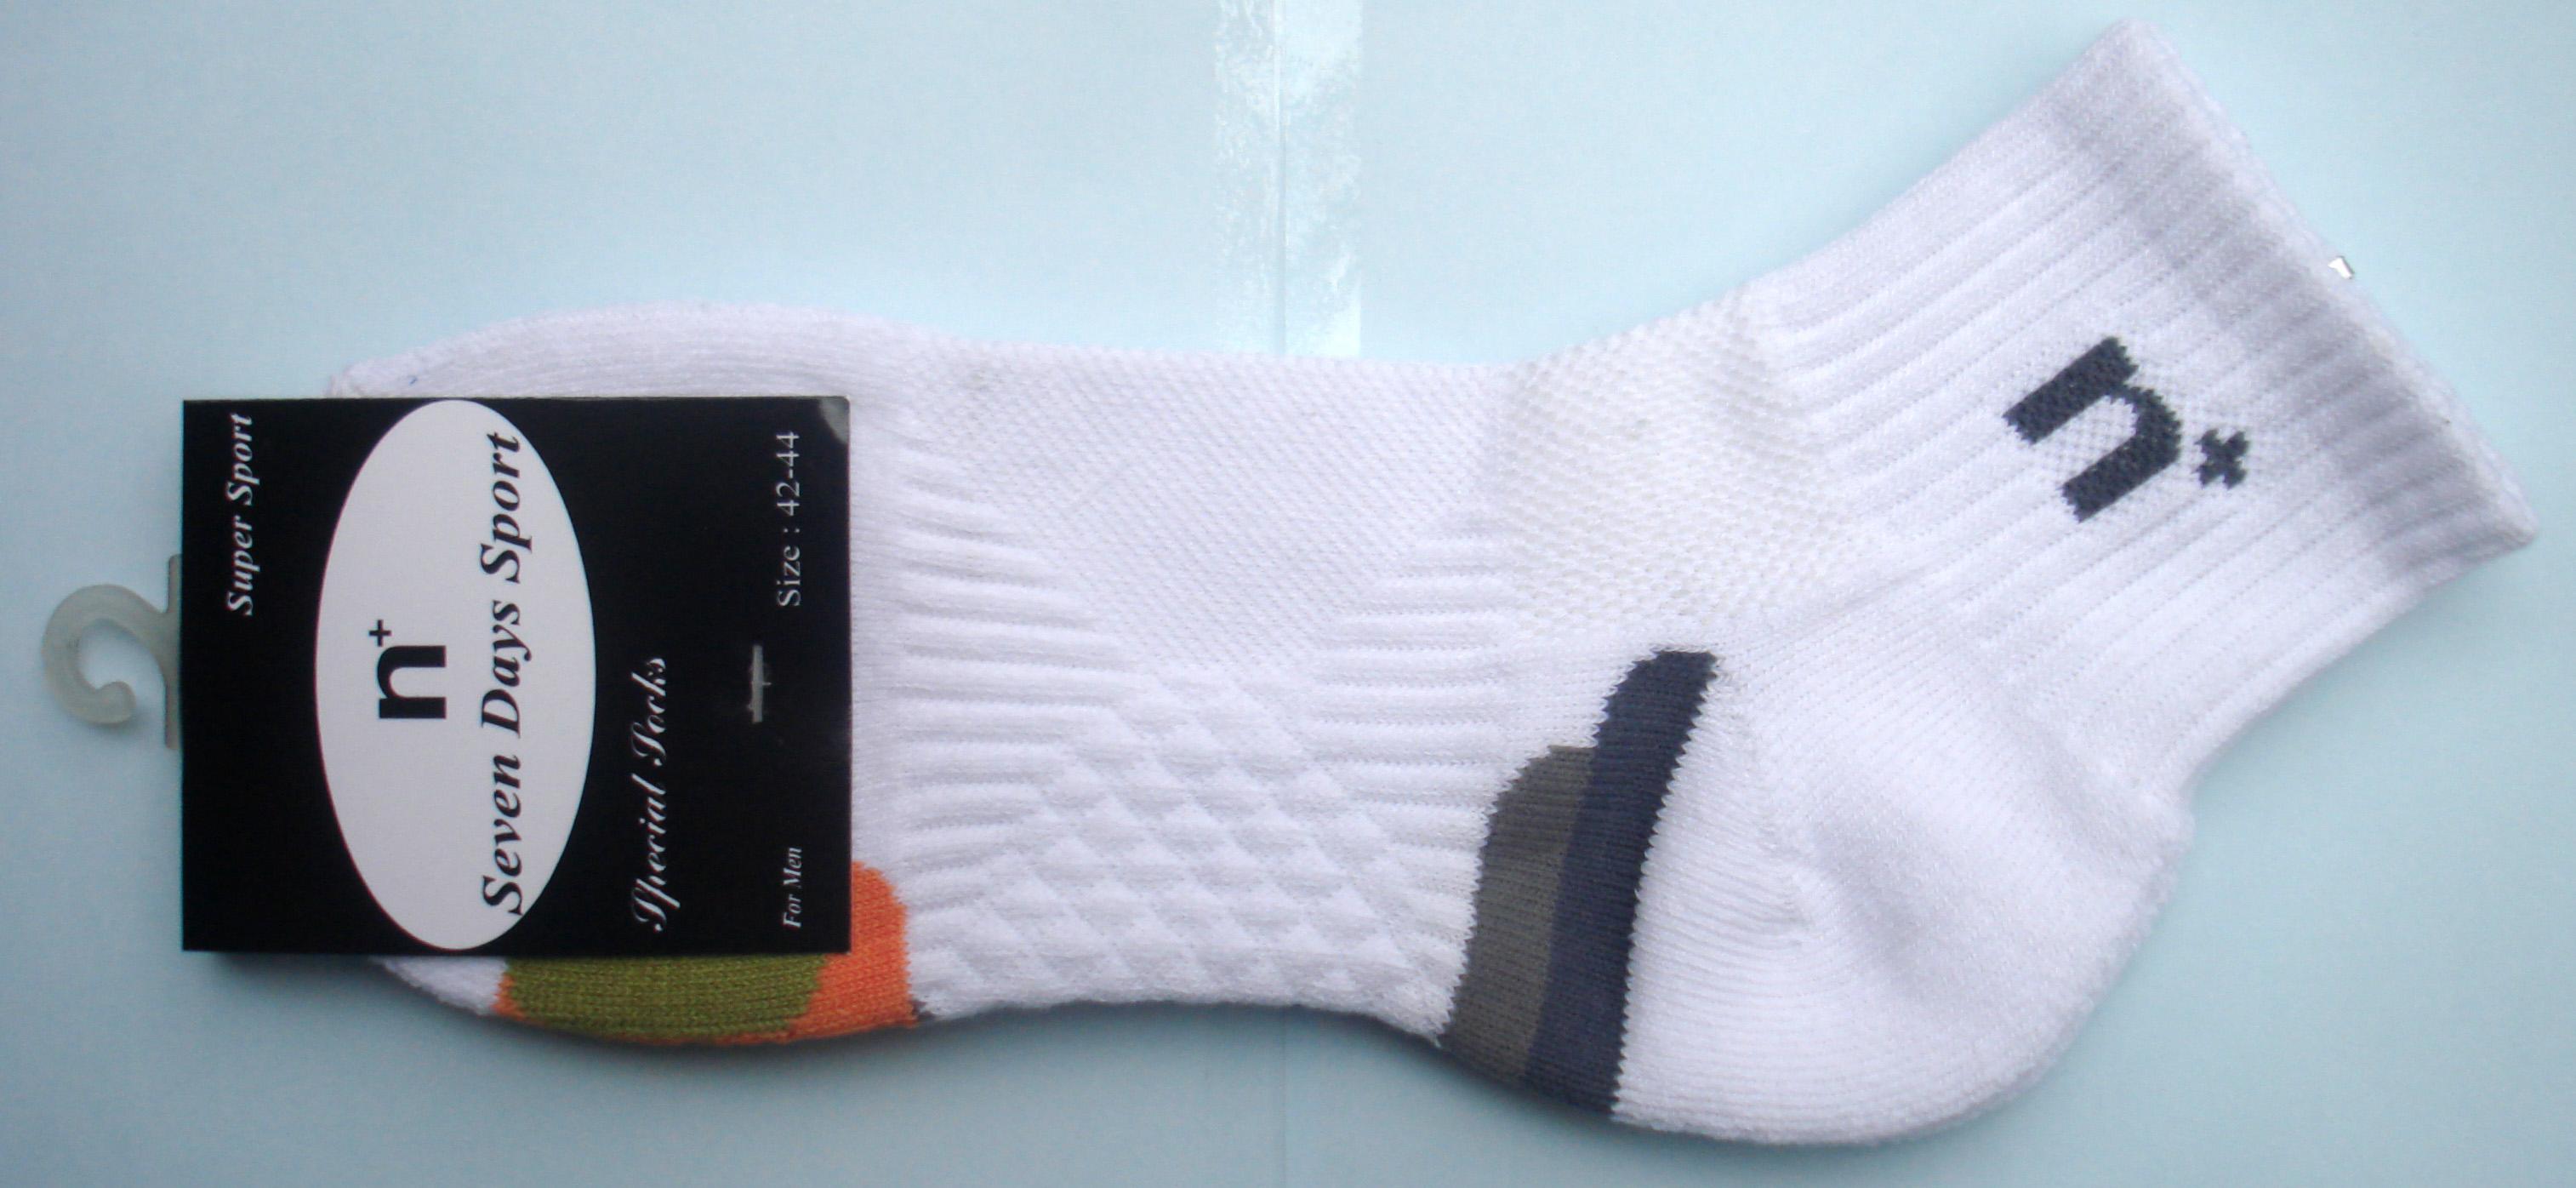 Tennis' socks